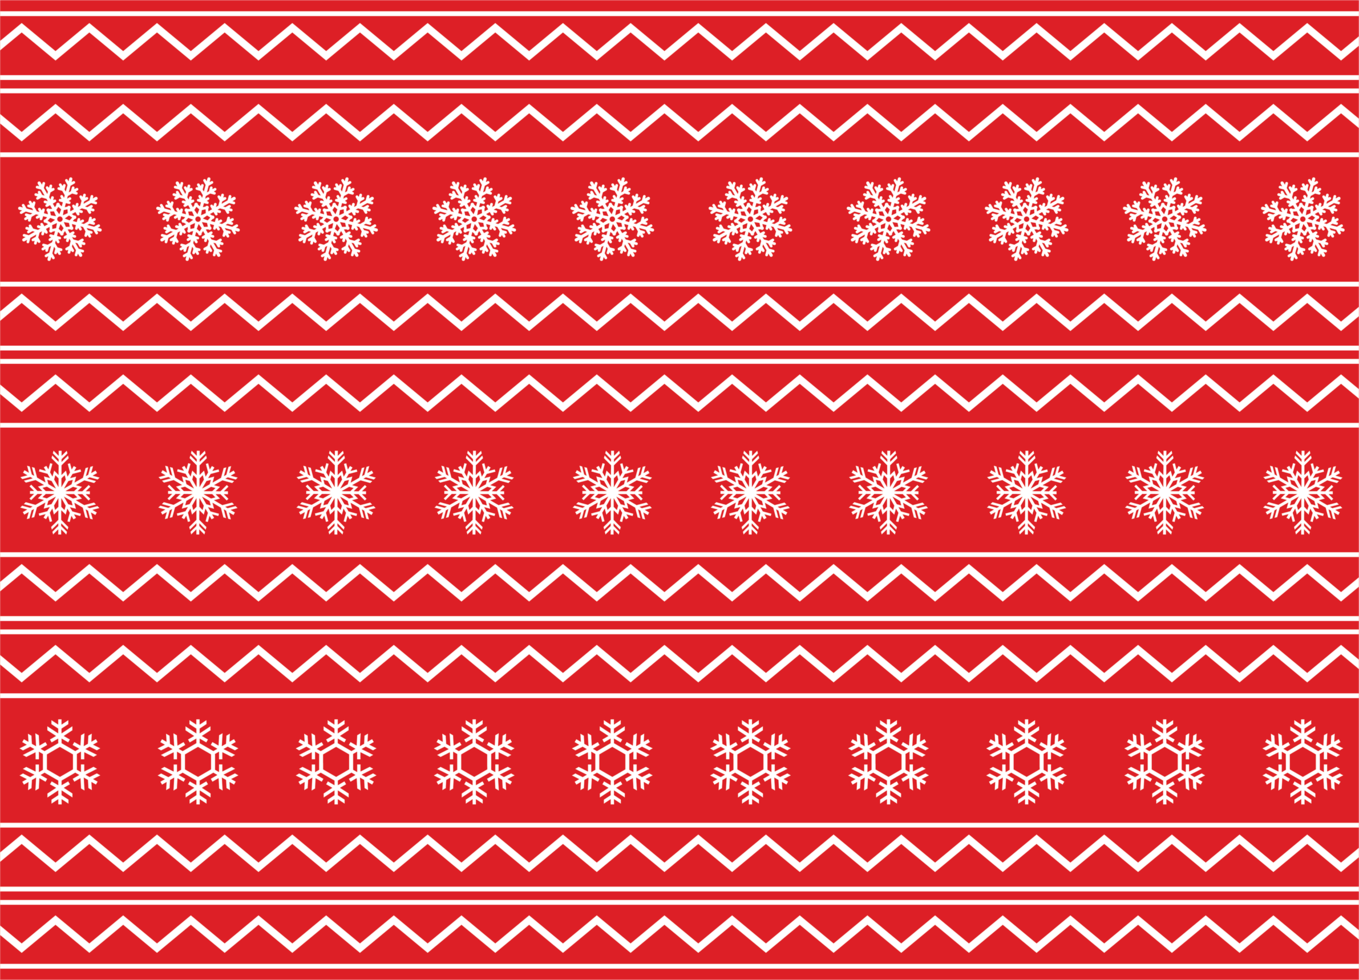 Natale seamless pattern vettore